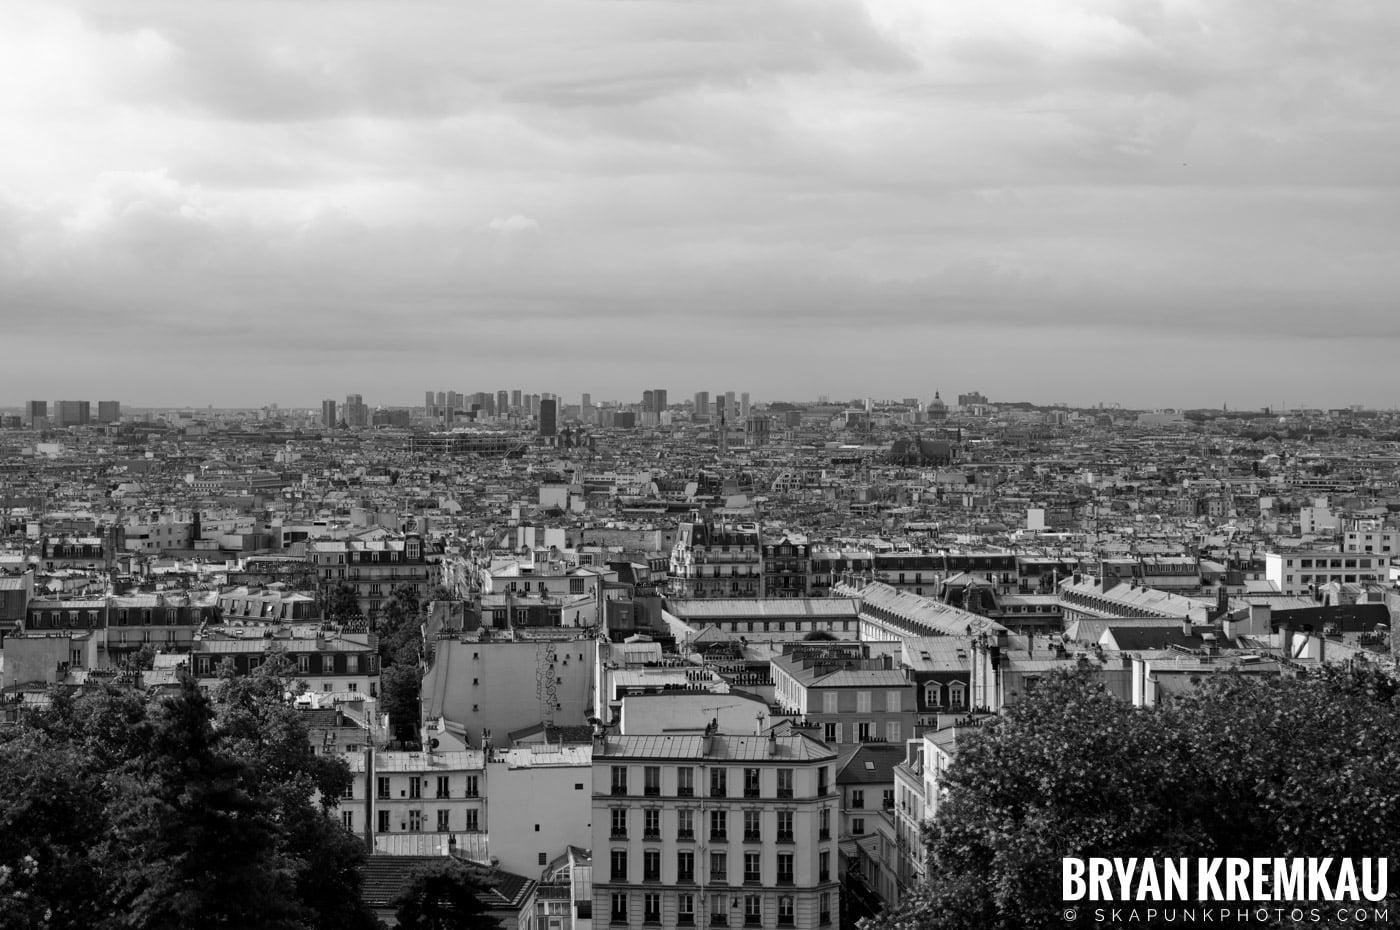 Paris, France Honeymoon - Day 6 - 7.23.11 (51)